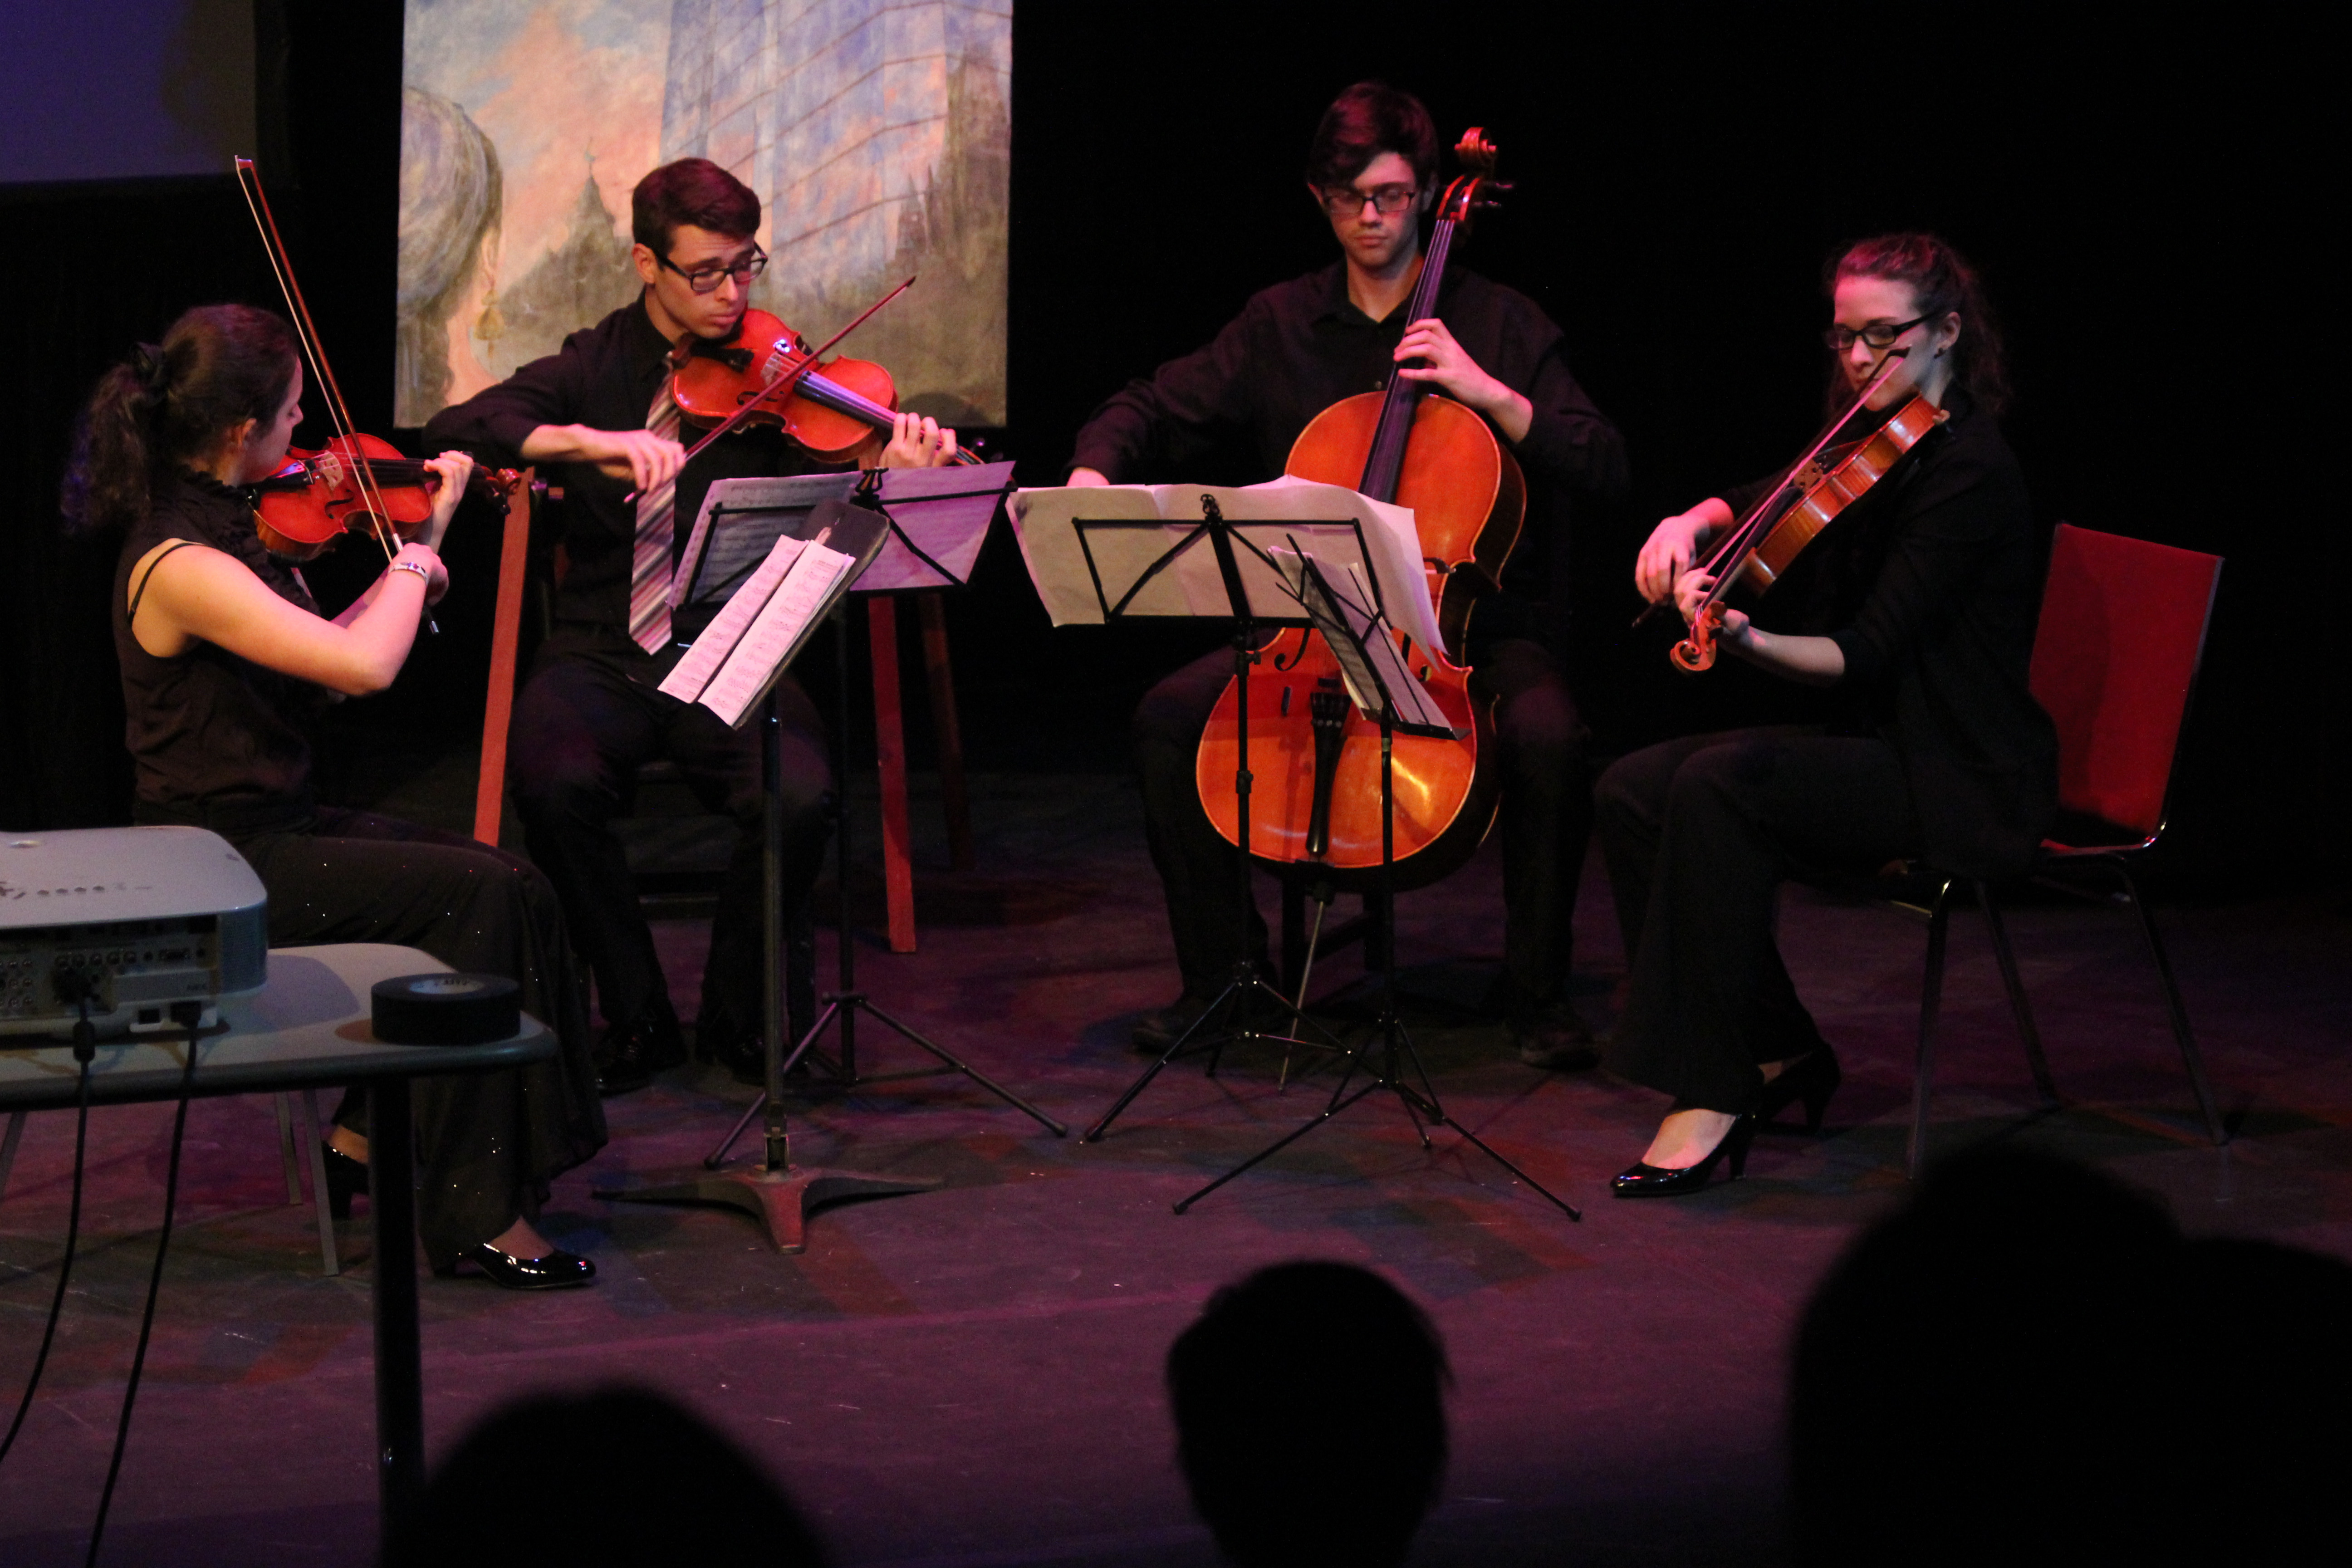 Opus Quartet, School of Music, University of Ottawa